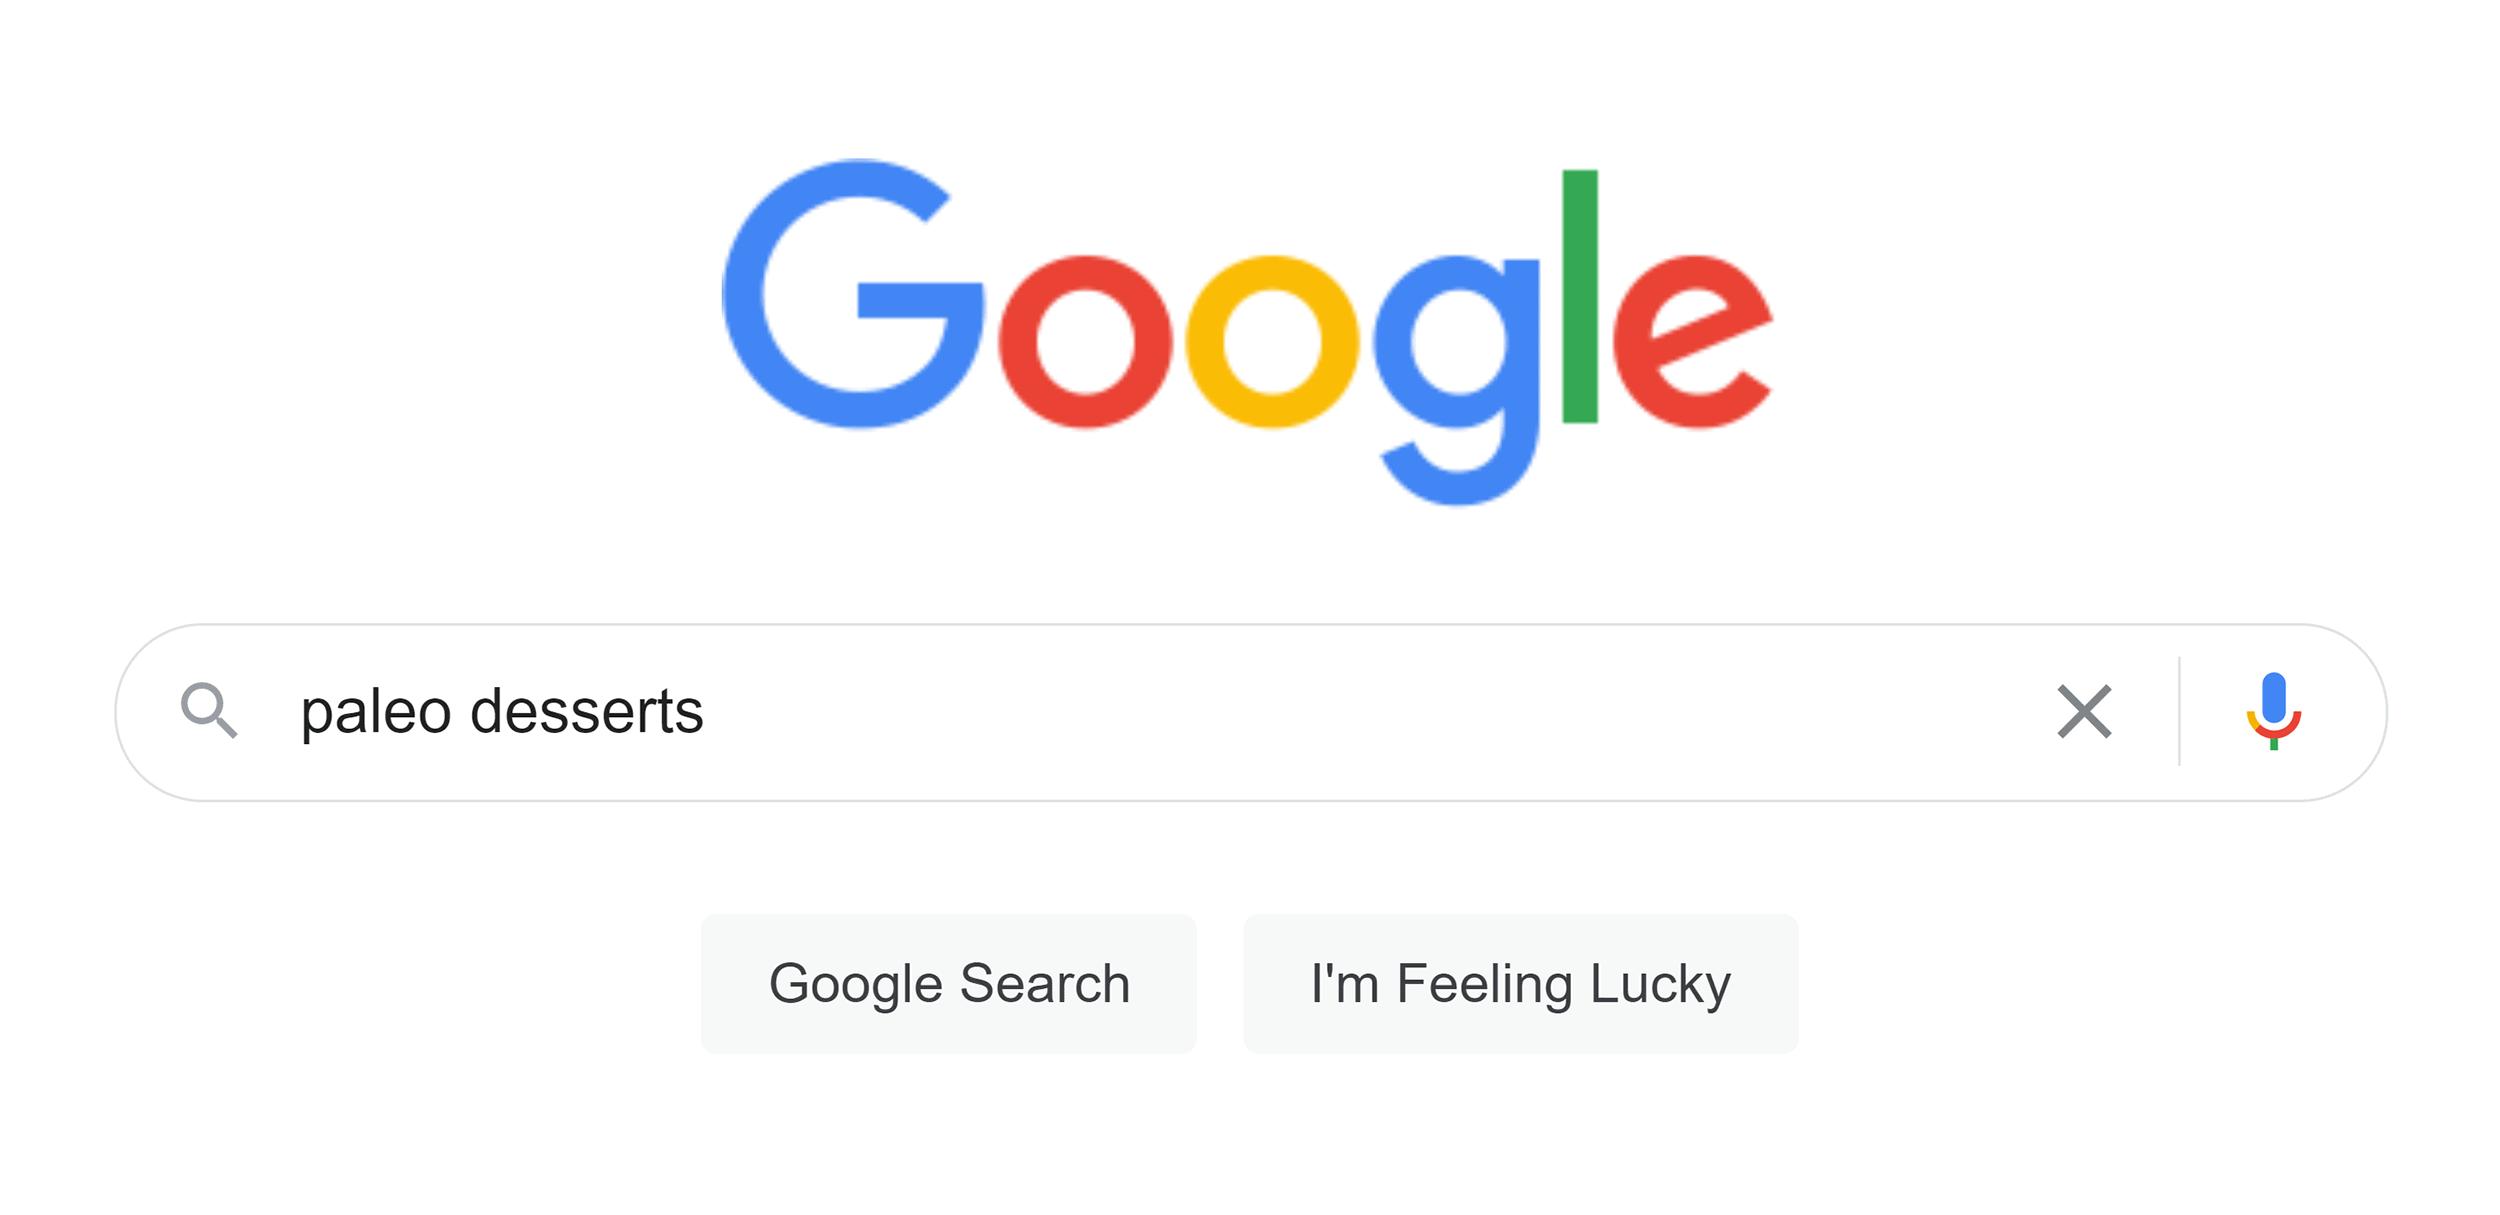 Google search – Paleo desserts